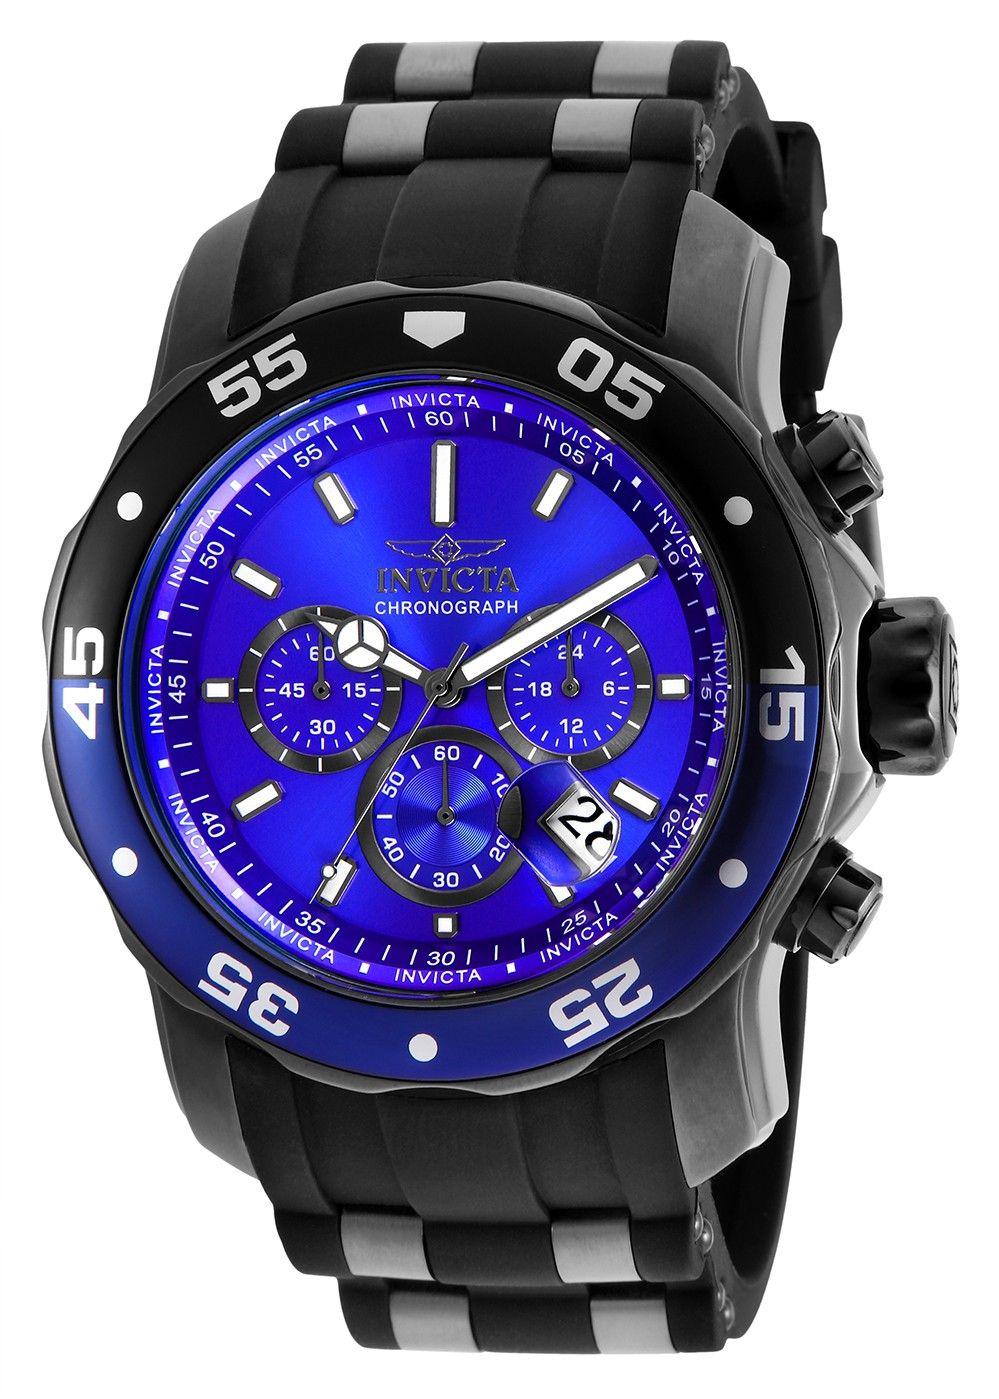 Invicta Pro Diver 26128 Chronograaf Herenhorloge Blauwe